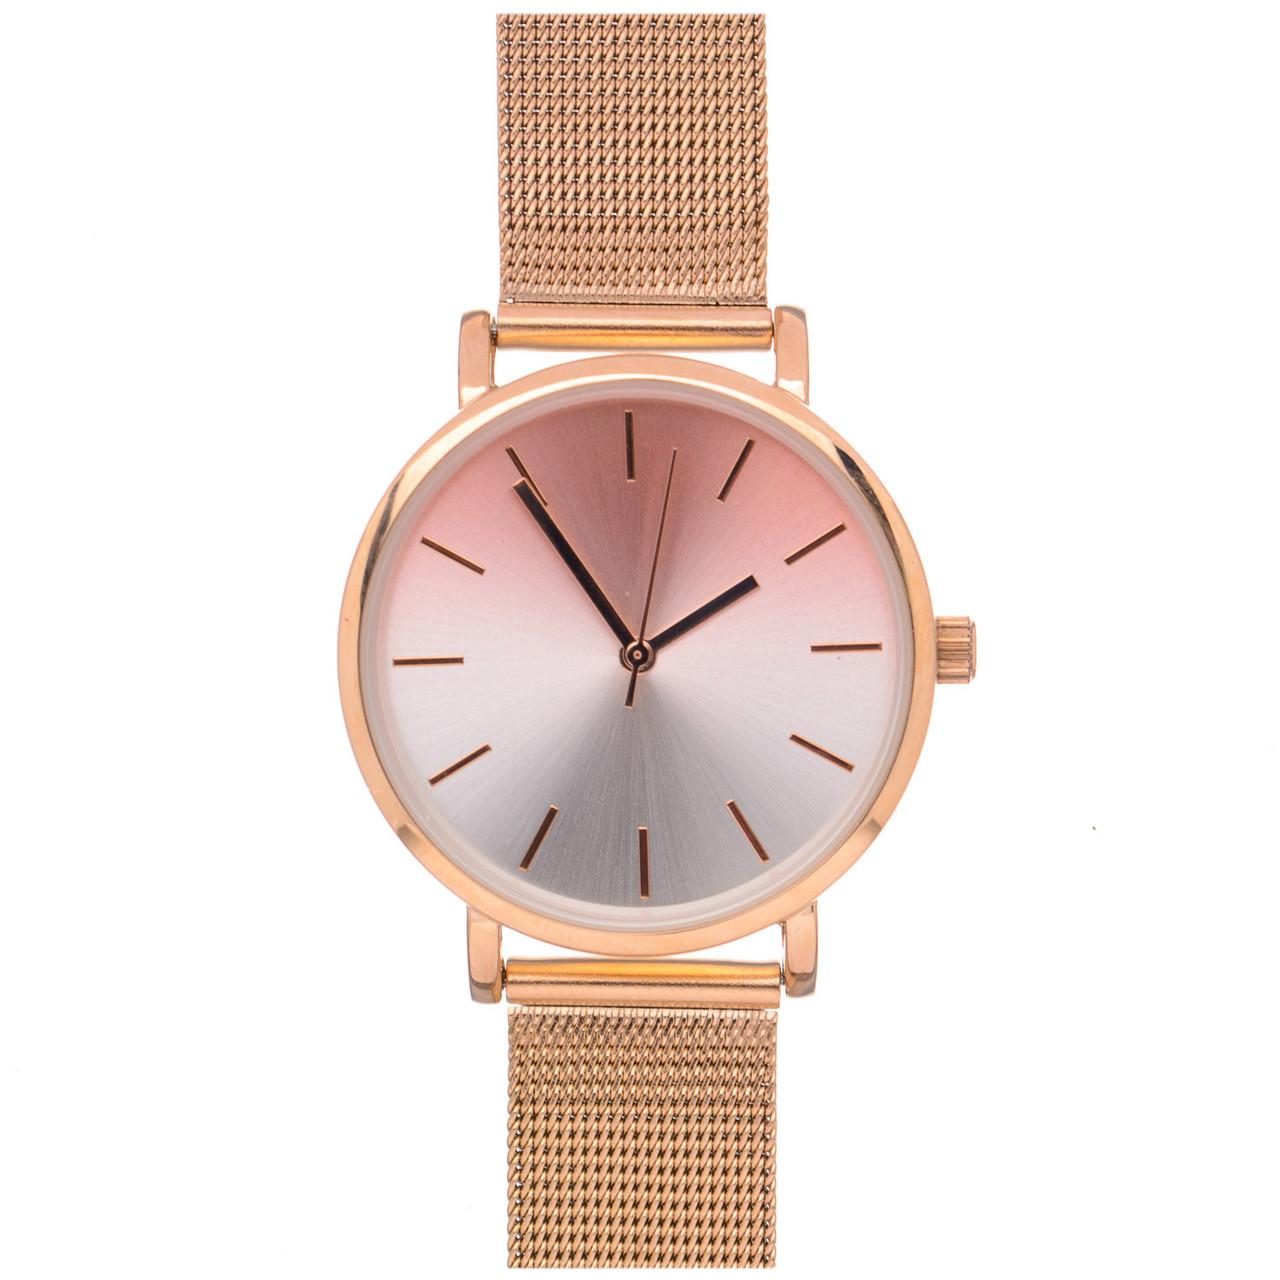 Жіночий годинник Even&Odd 17-079 Gold Pink